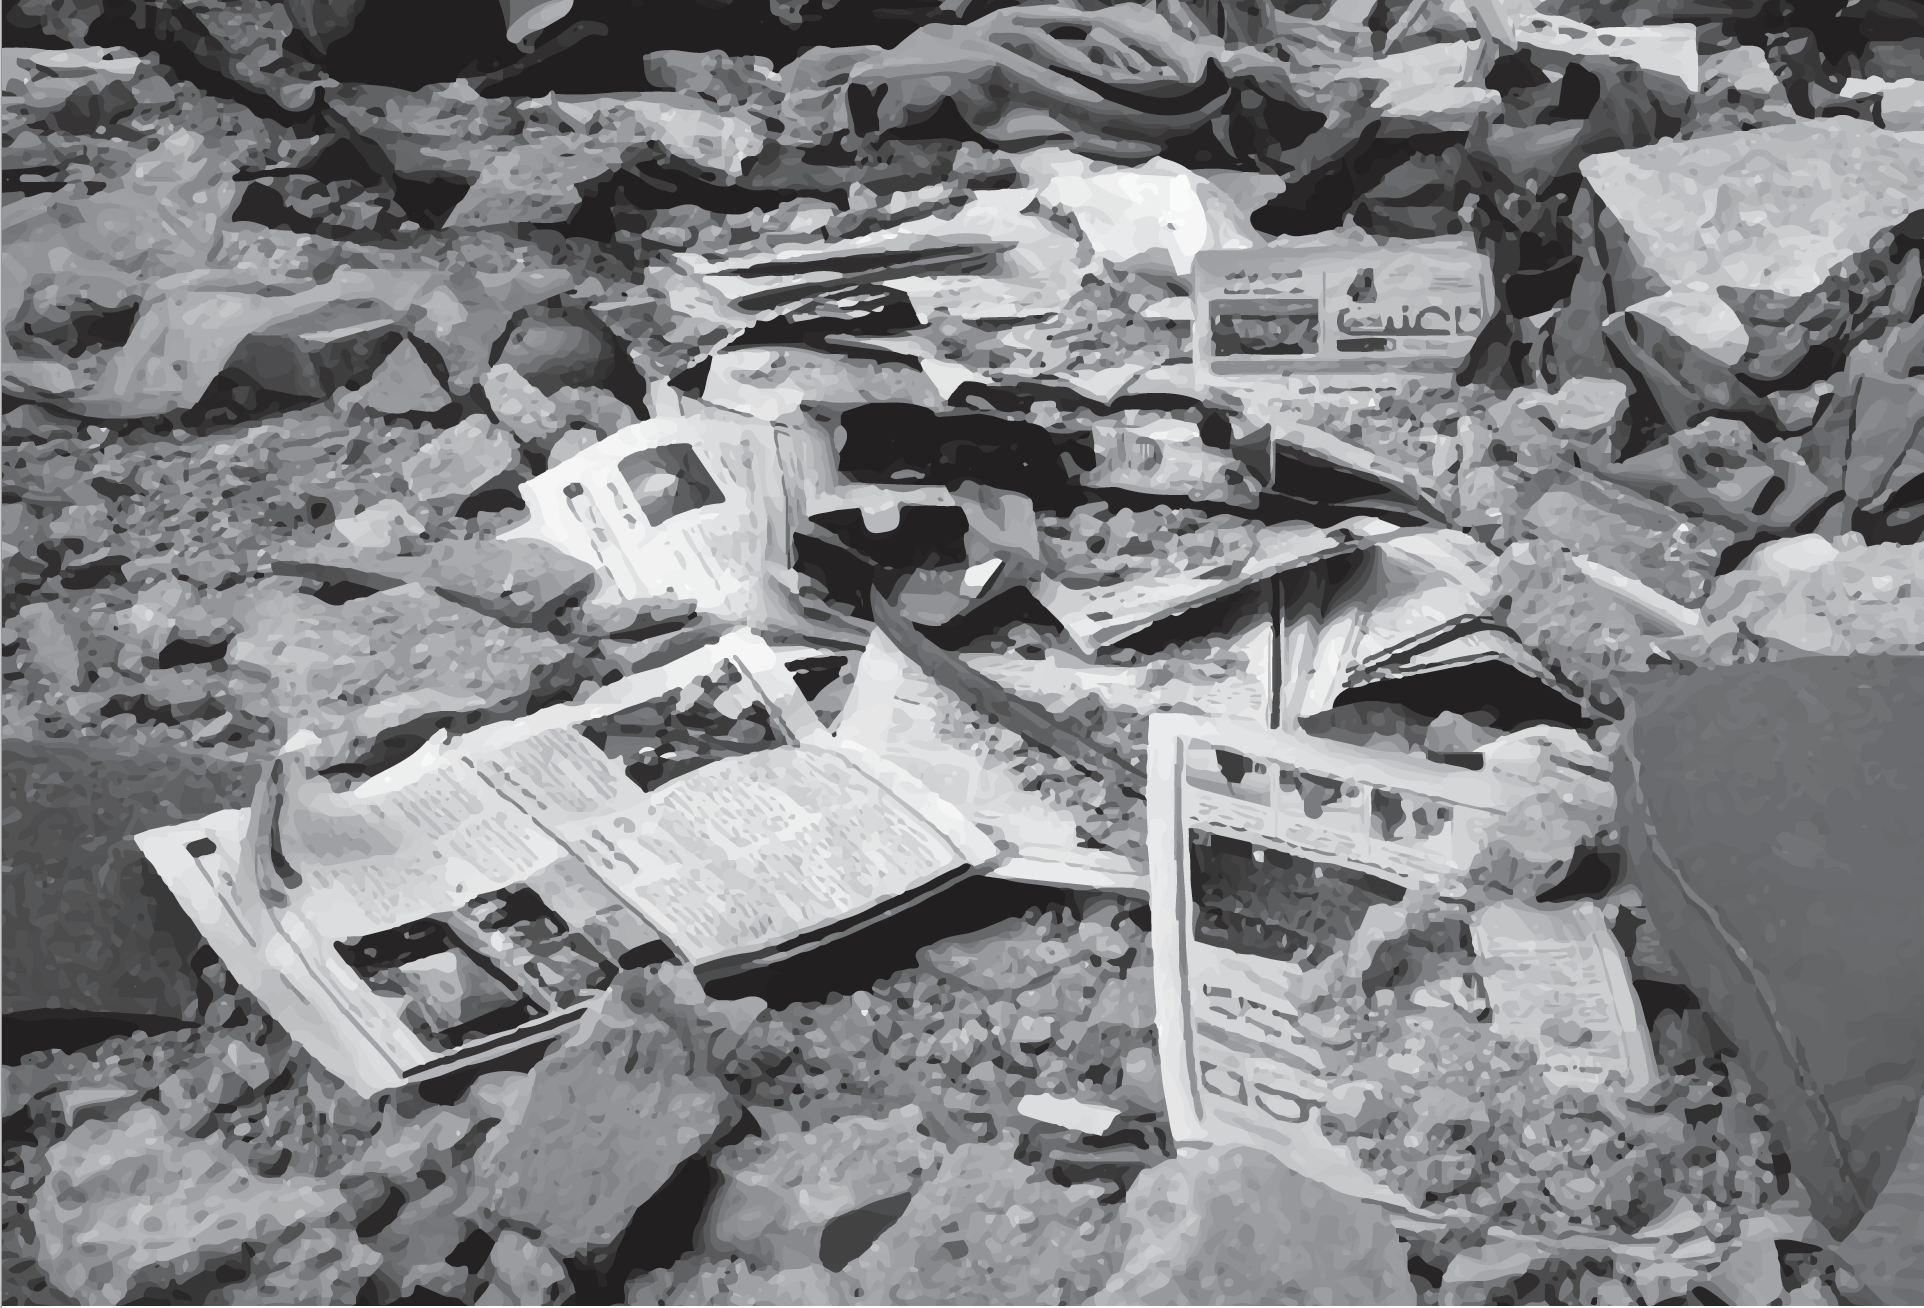 Copies of Enab Baladi newspaper's 45 issue among the debris of a destroyed building in the city of Daraya, rural Damascus (December 2013) photo credit: Enab Baladi